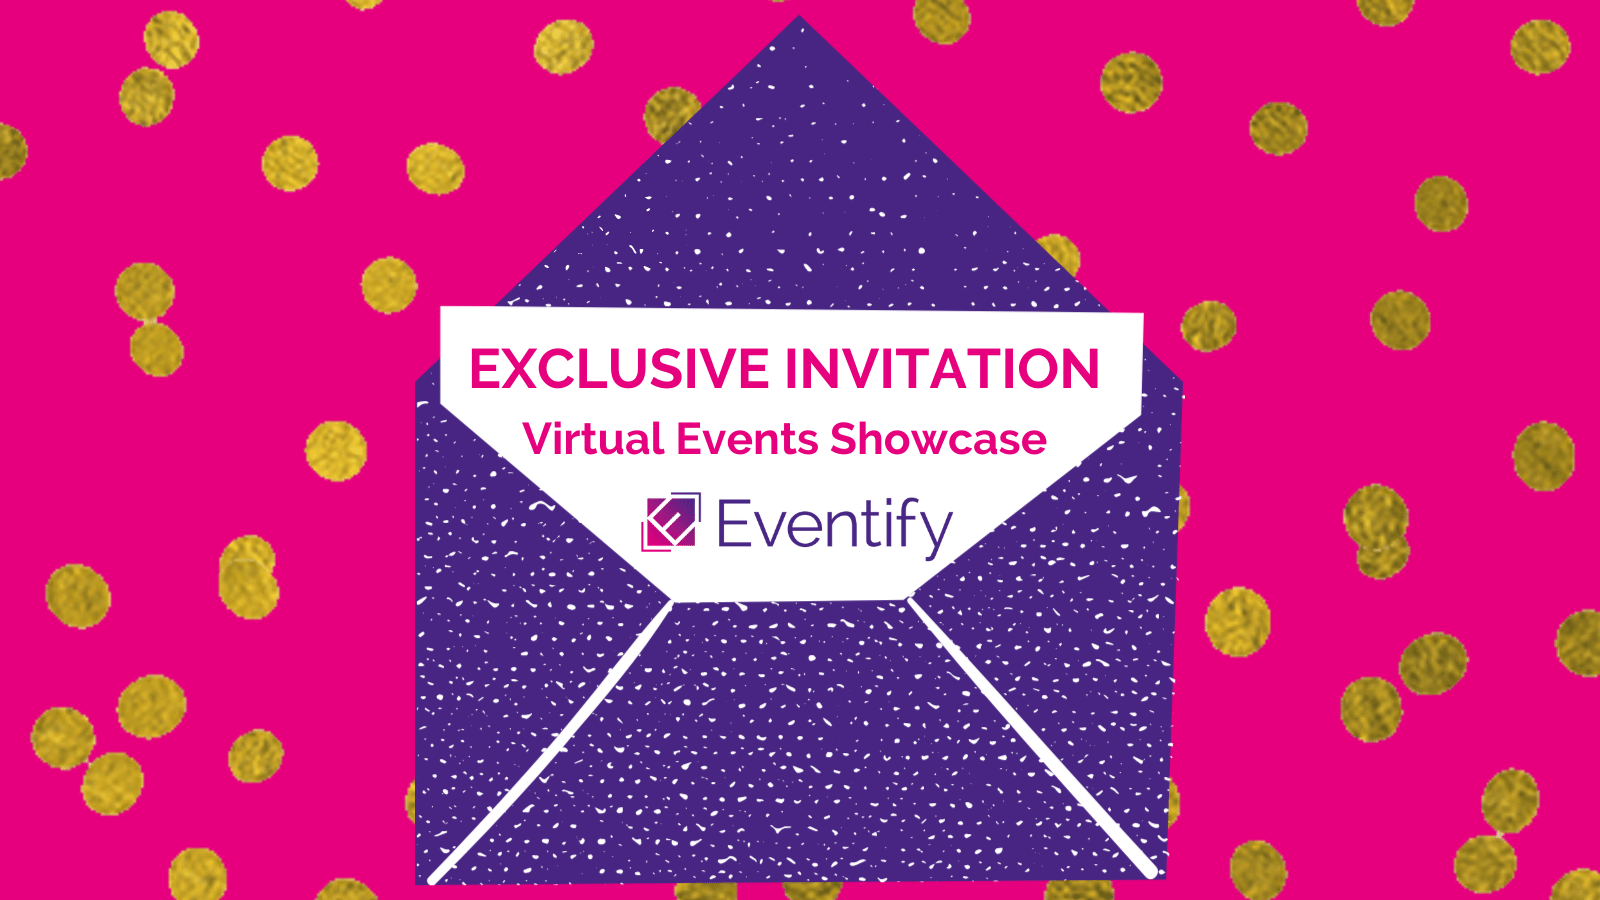 Virtual Events Showcase